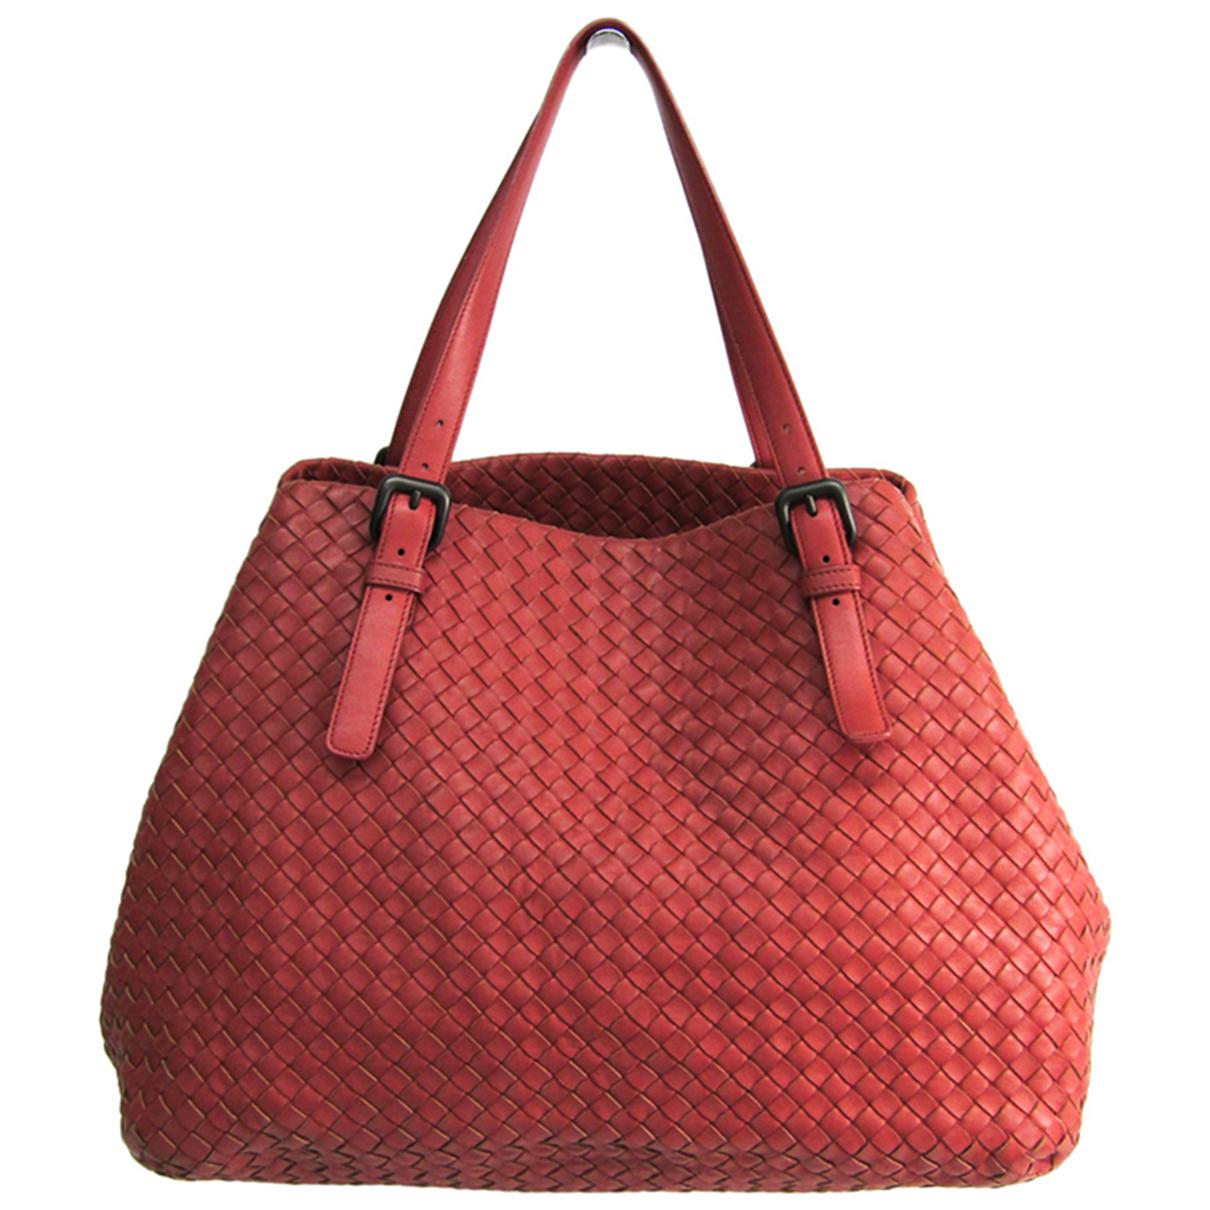 Bottega Veneta - Sac a main Fourre-Tout  pour femme en cuir - rose